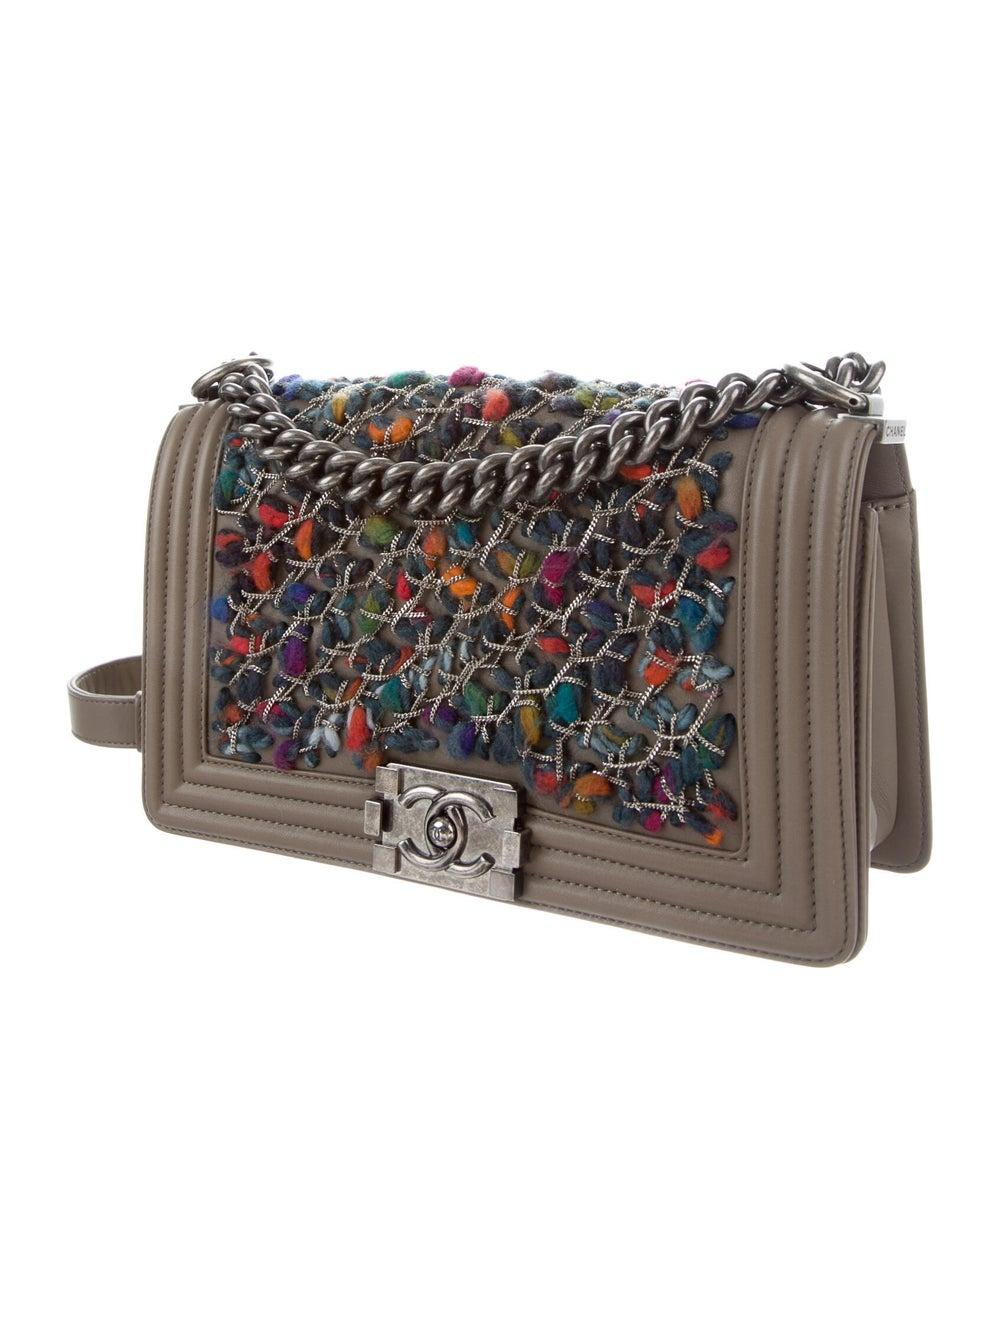 Chanel Medium Tweed Chain Boy Bag Brown - image 3